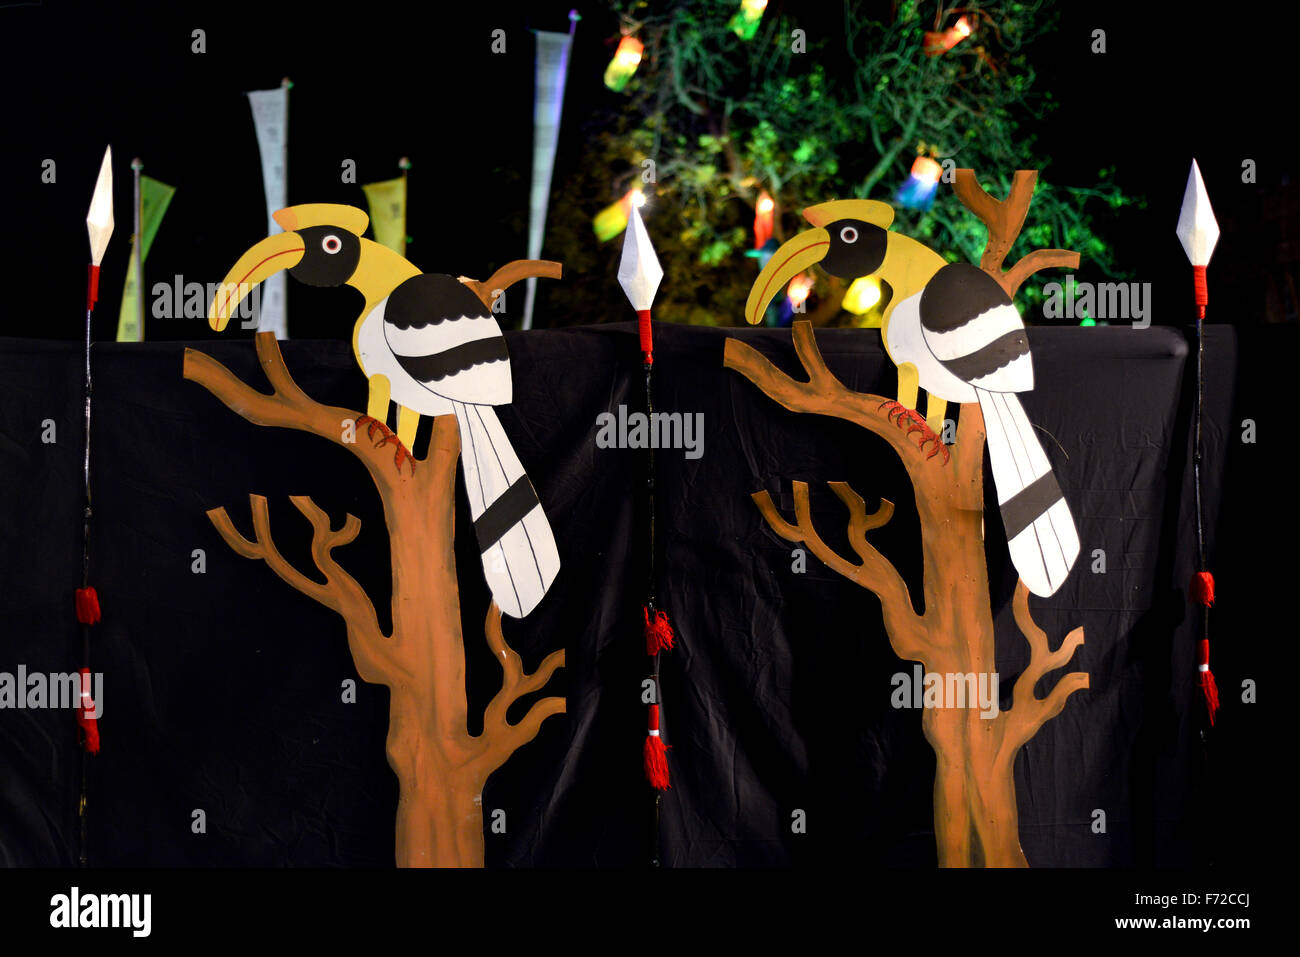 Uccelli decorativi immagini uccelli decorativi fotos stock alamy